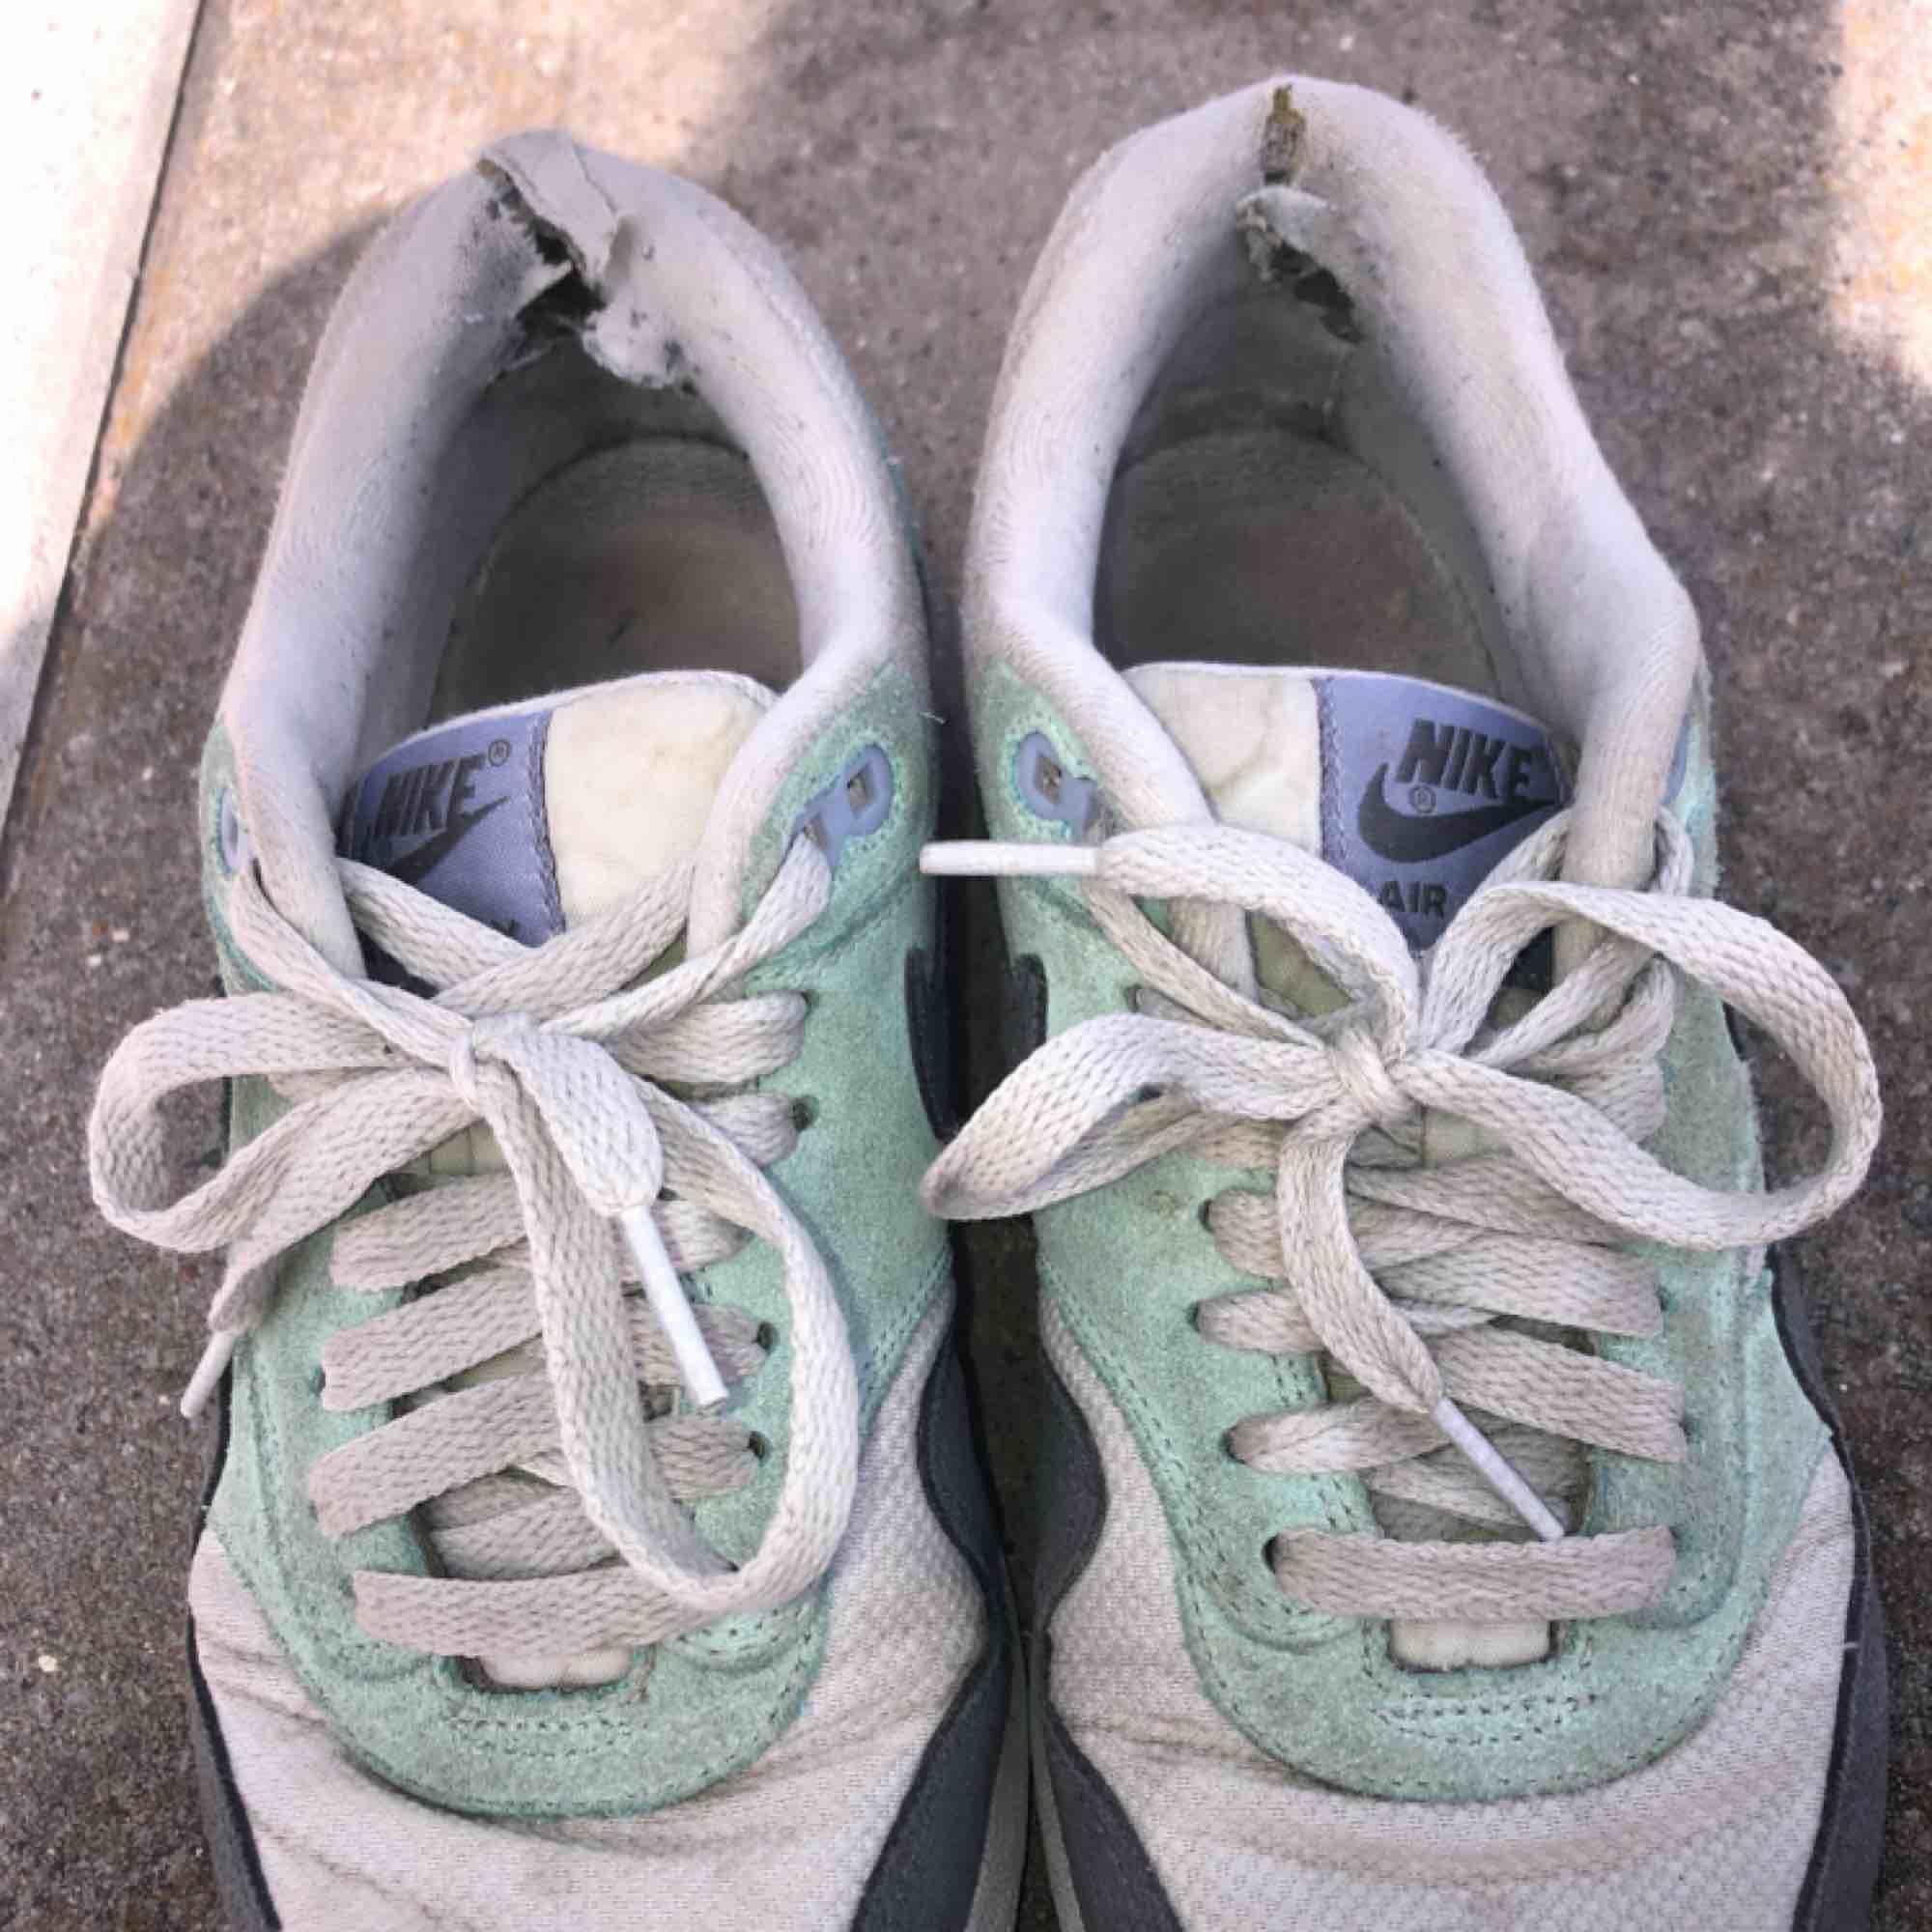 Slitna men snygga Nike Air sneakers Storlek 38 Pris kan diskuteras. Skor.